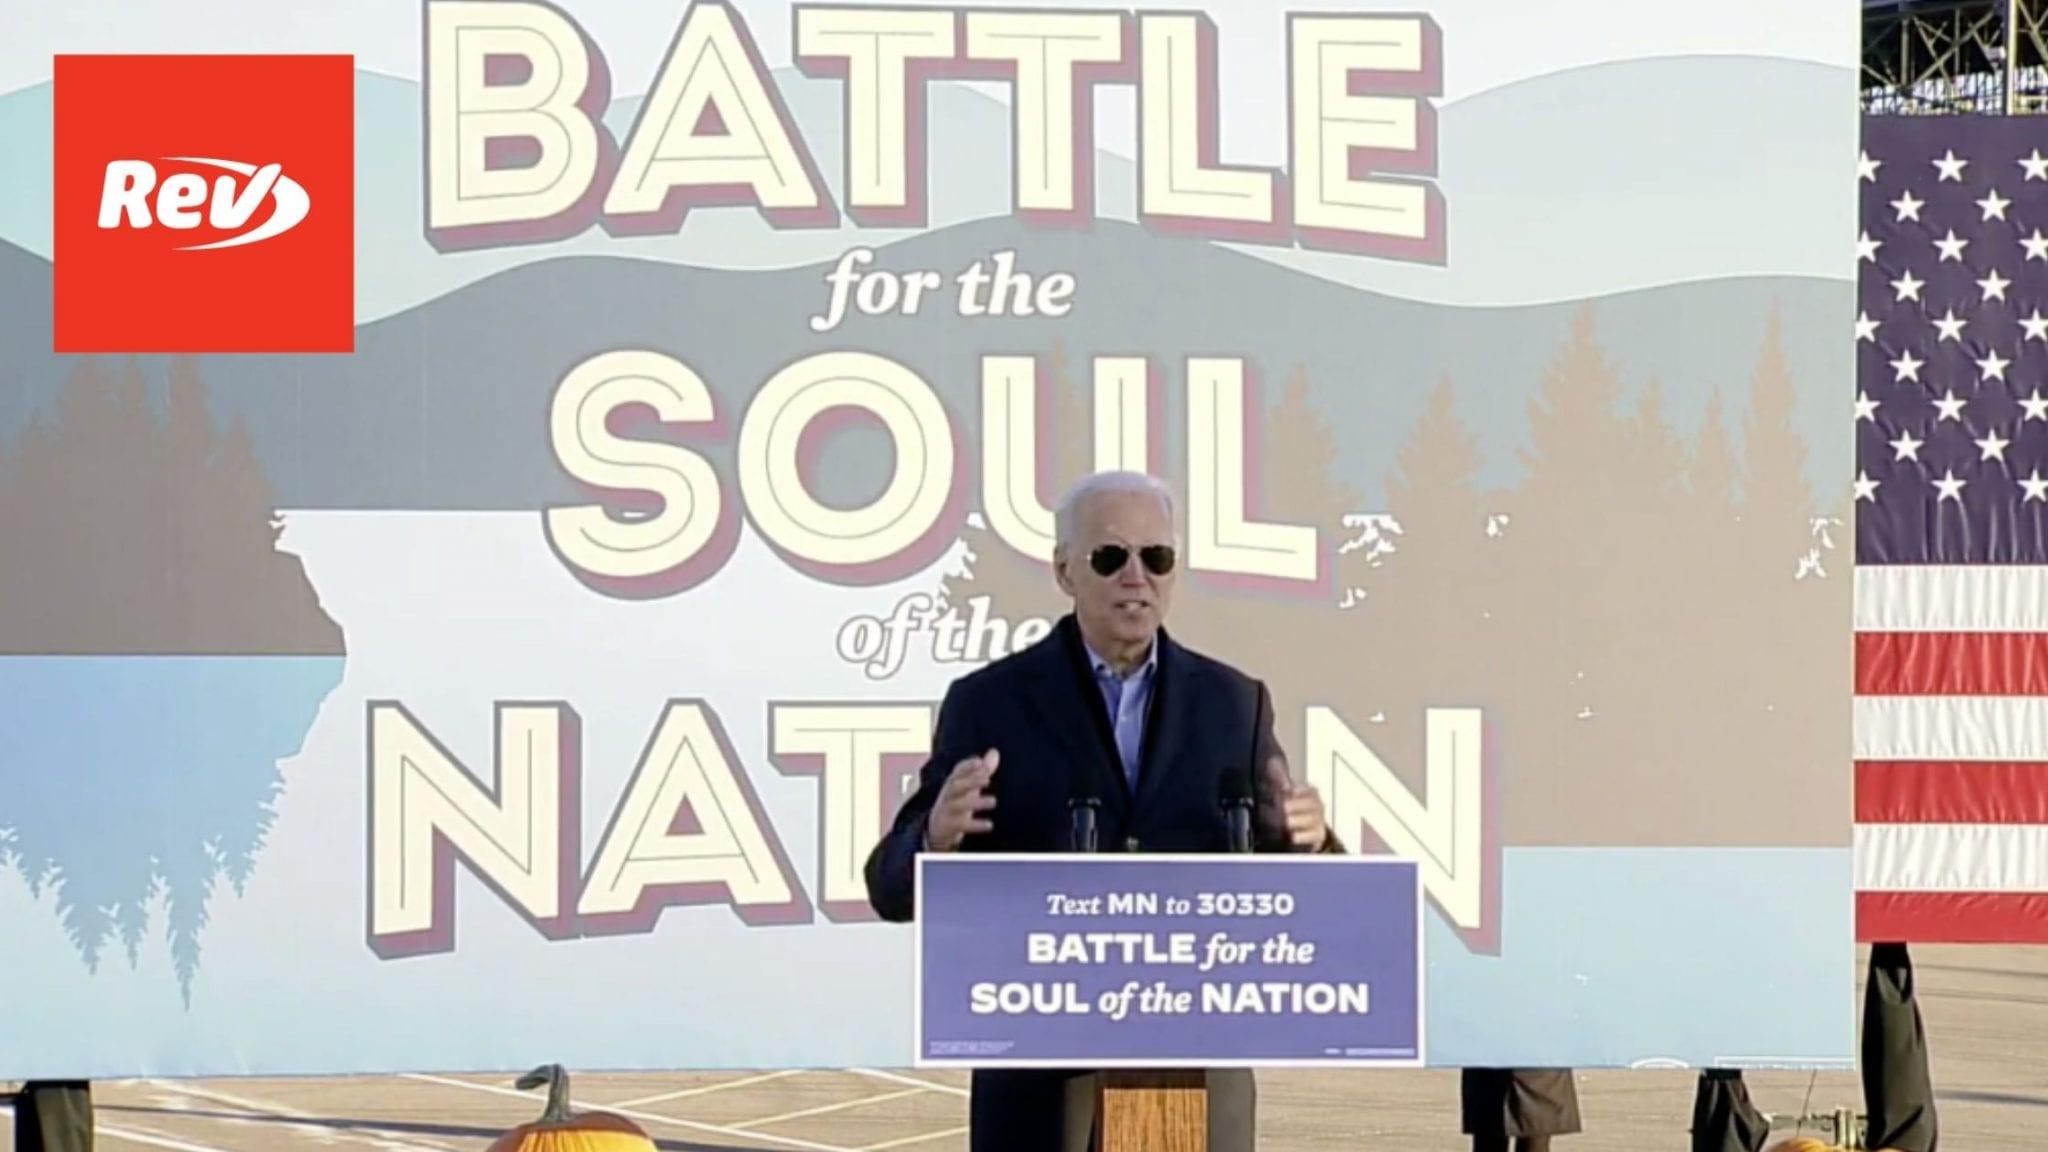 Joe Biden Campaign Event Speech Transcript St. Paul, Minnesota October 30